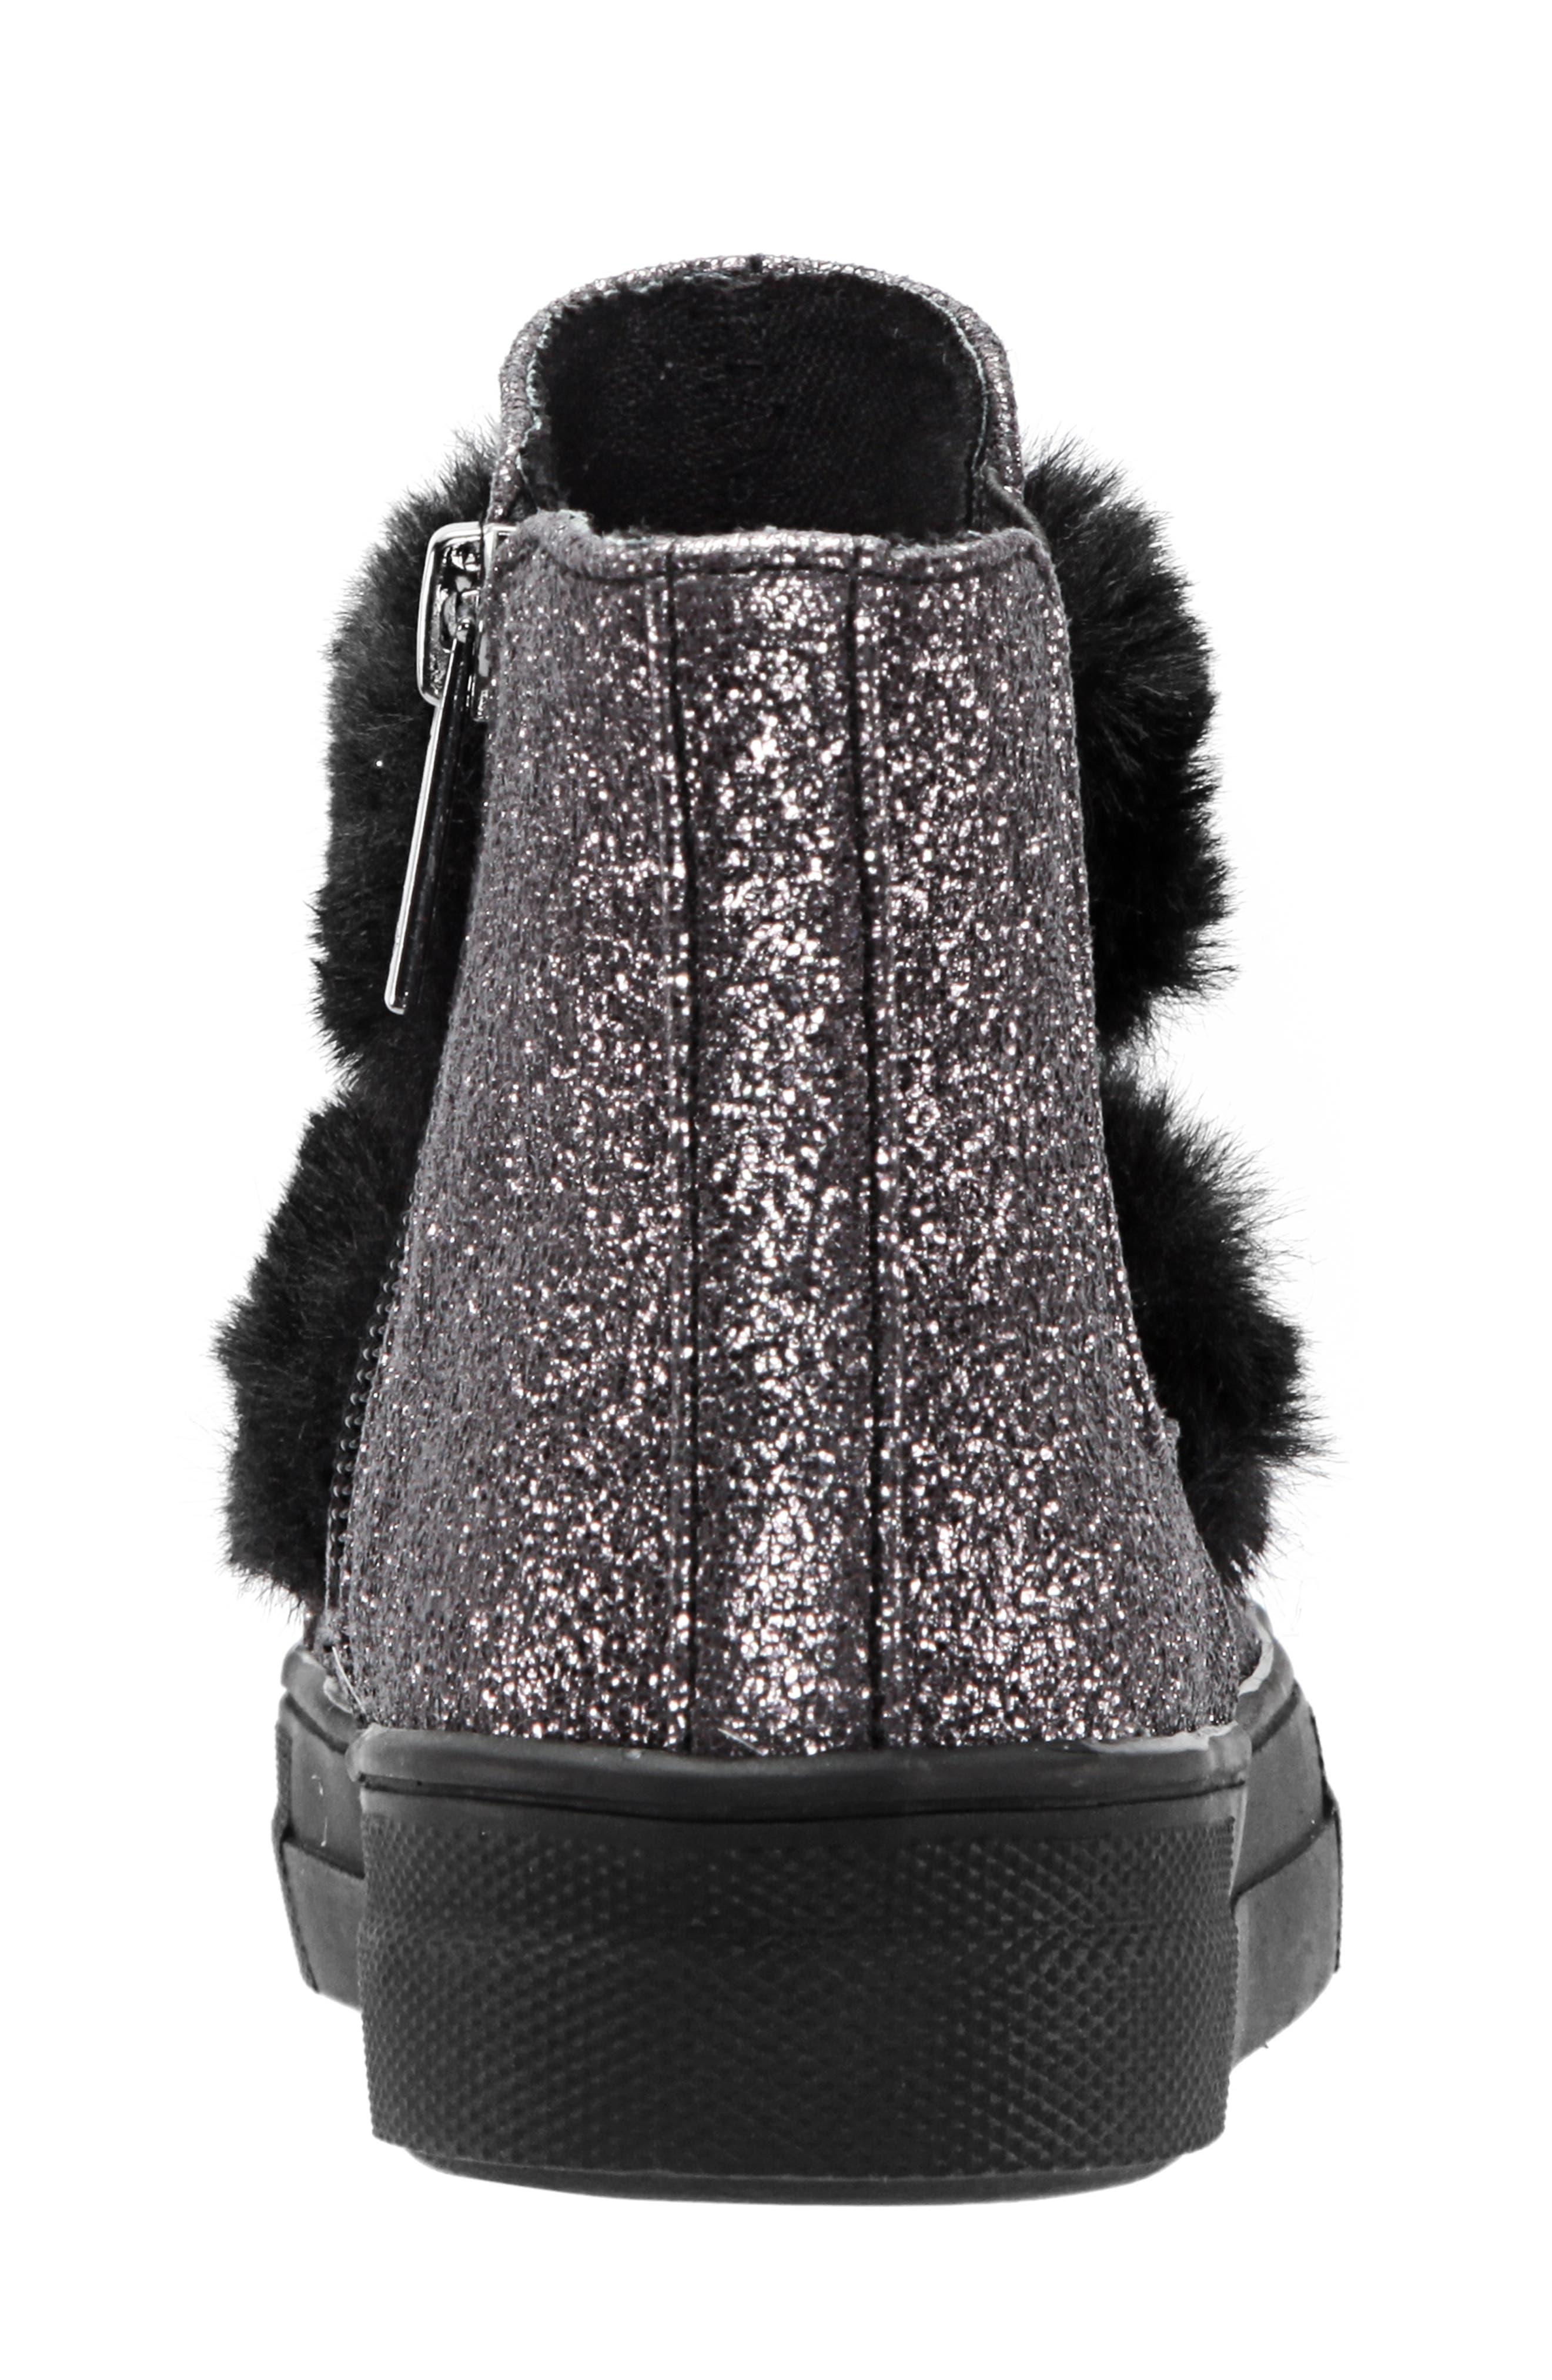 Helen Faux Fur Bootie Sneaker,                             Alternate thumbnail 7, color,                             PEWTER CRACKLE METALLIC